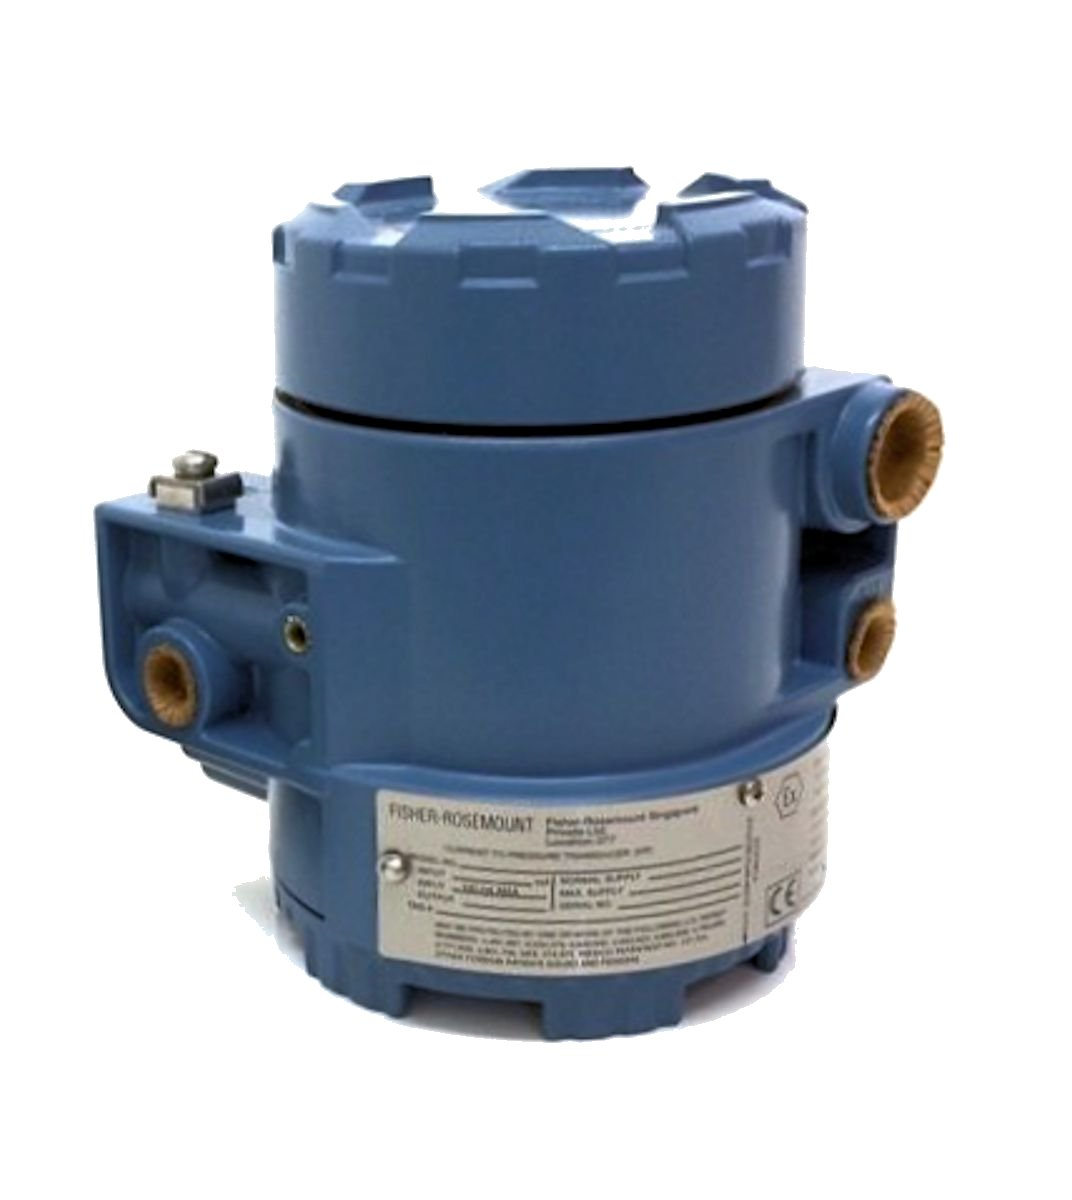 Rosemount 3311 I/P Transducer